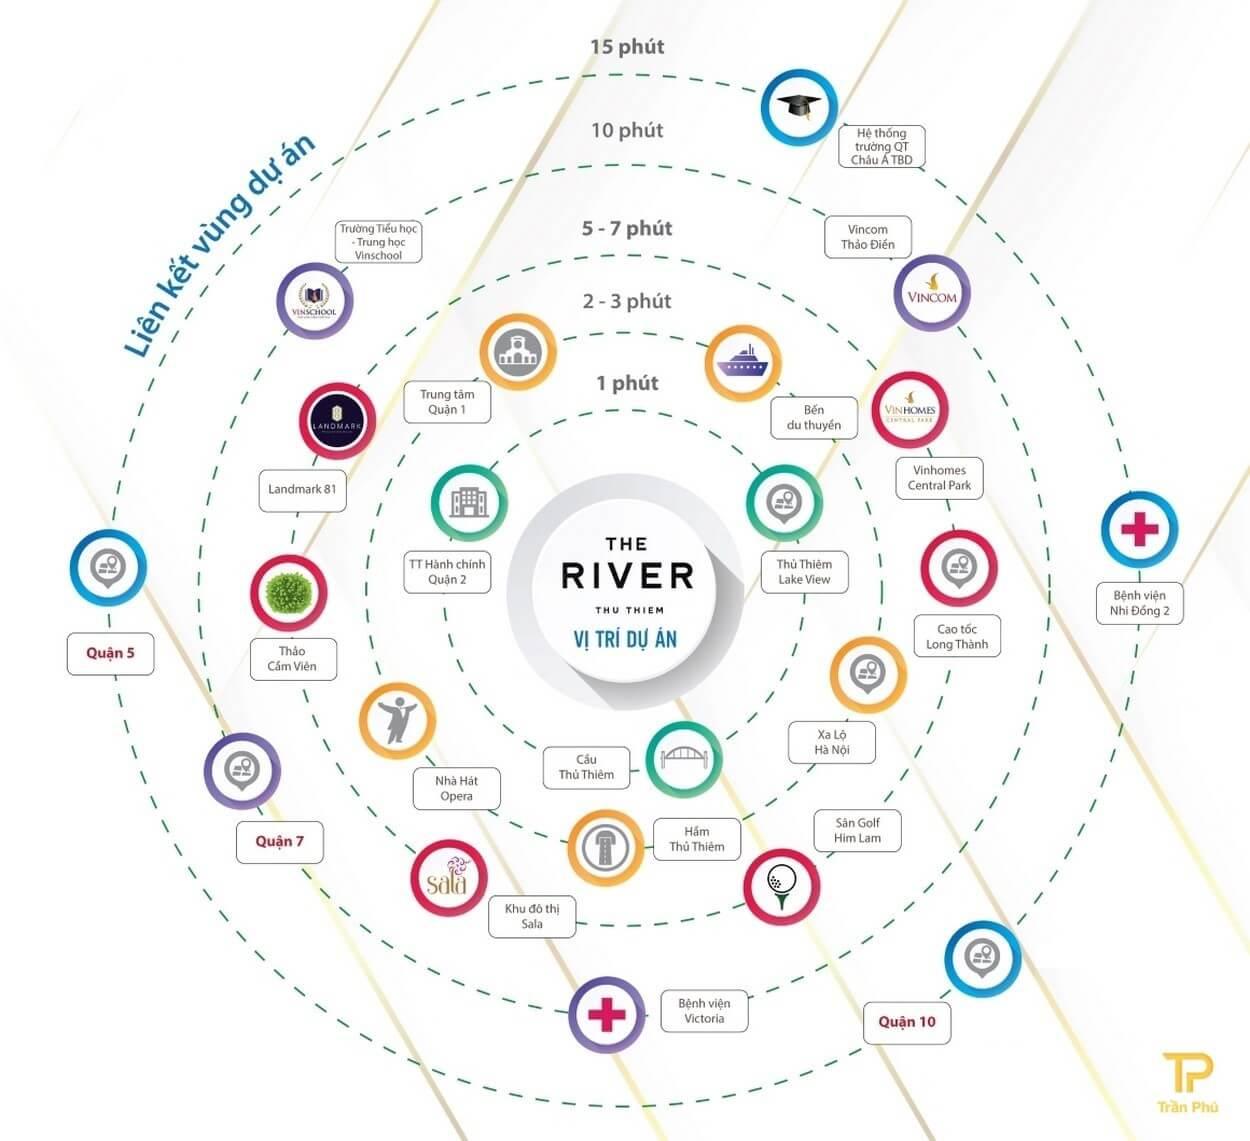 The River Thu Thiem quan 2